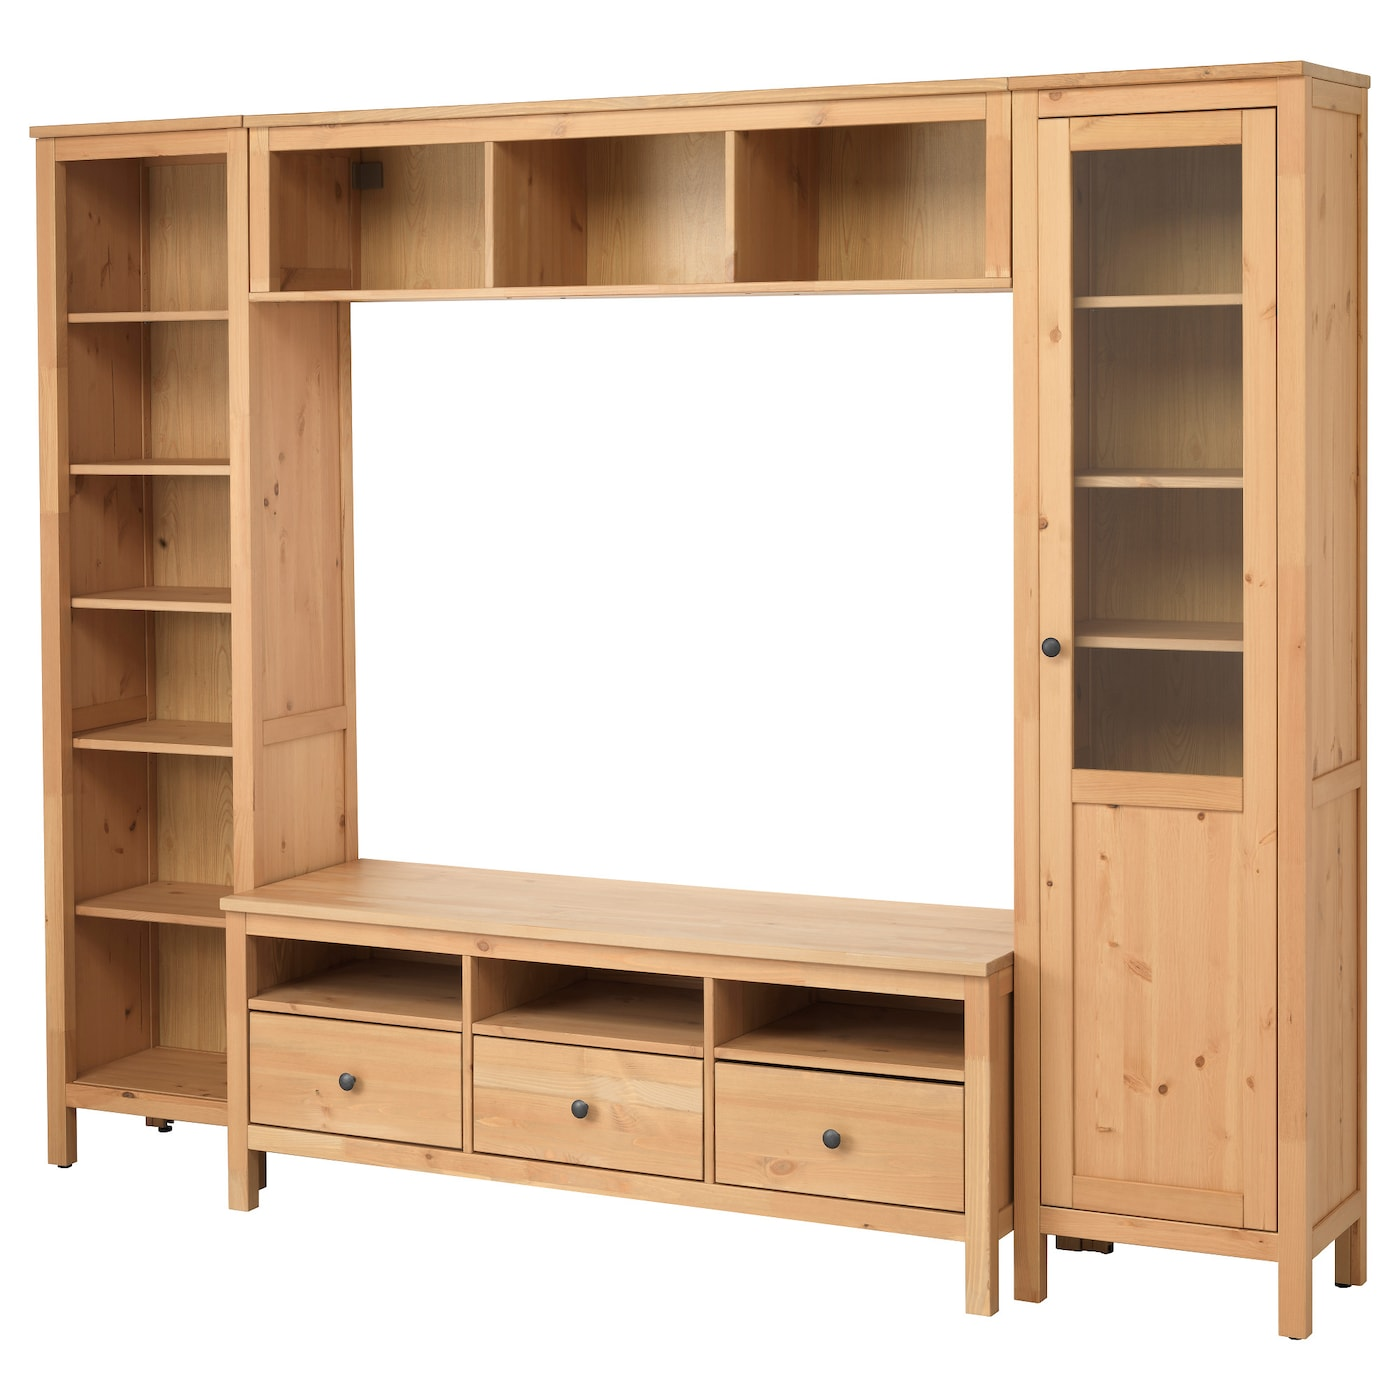 Muebles de tv y muebles para el sal n compra online ikea for Mueble hemnes ikea